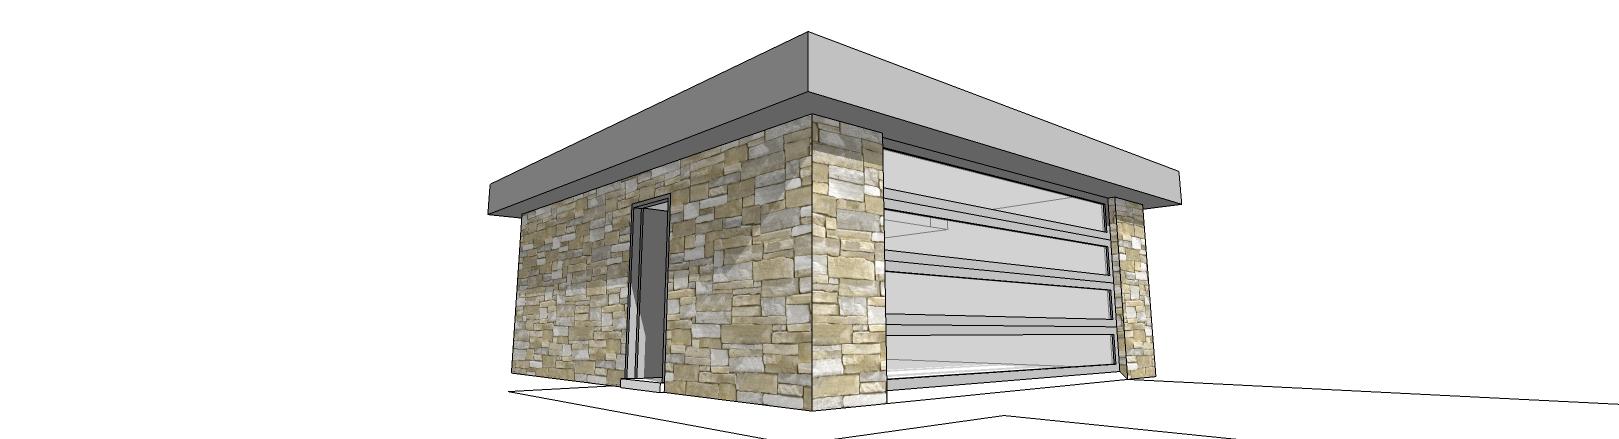 Modern garage with translucent doors 44049td cad for Translucent garage doors